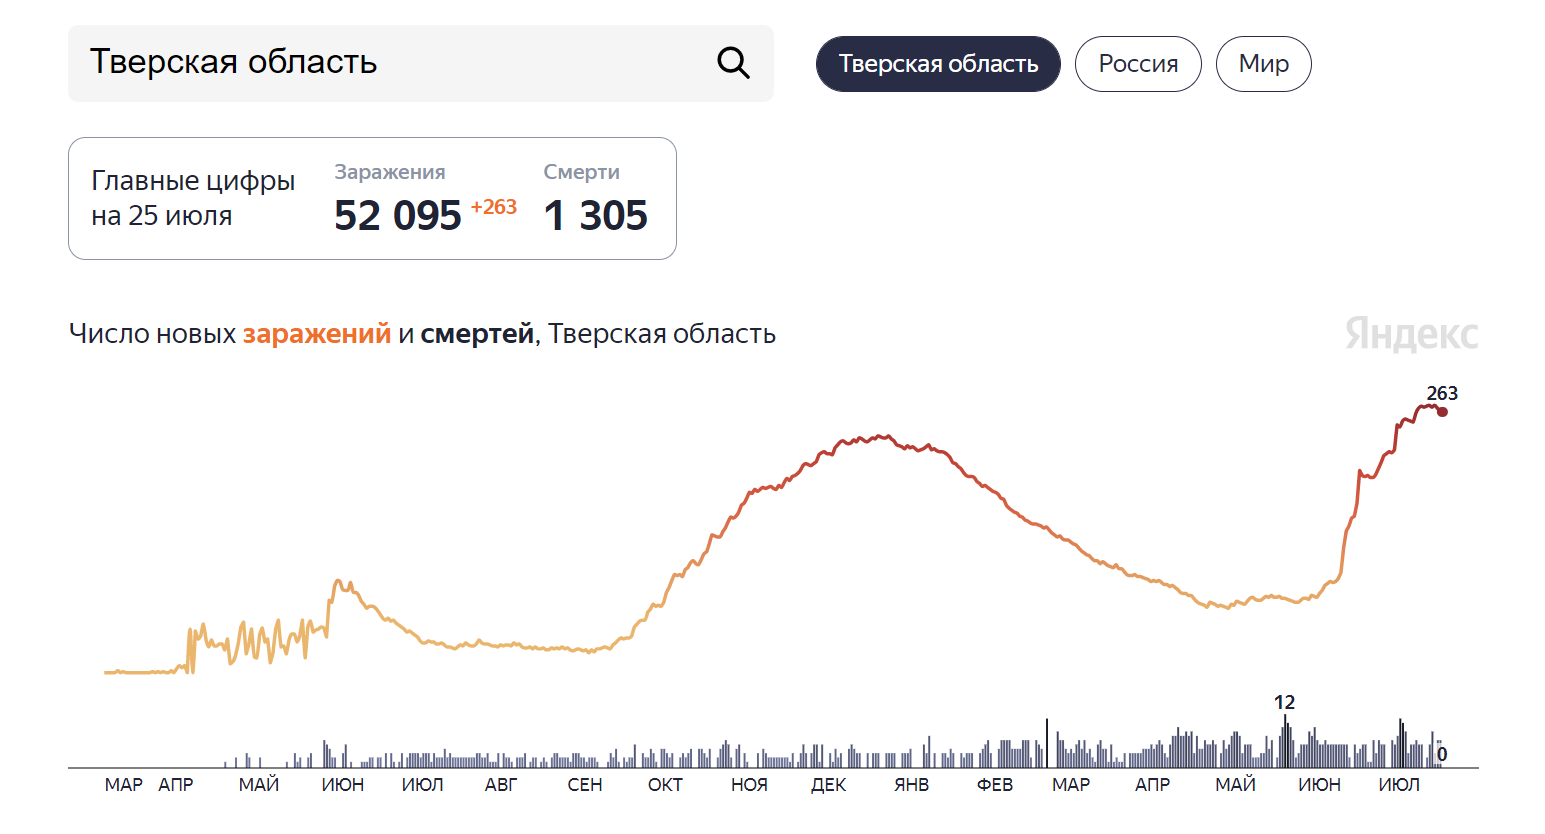 Ковид в Тверской области идёт на спад: статистика на 25 июля